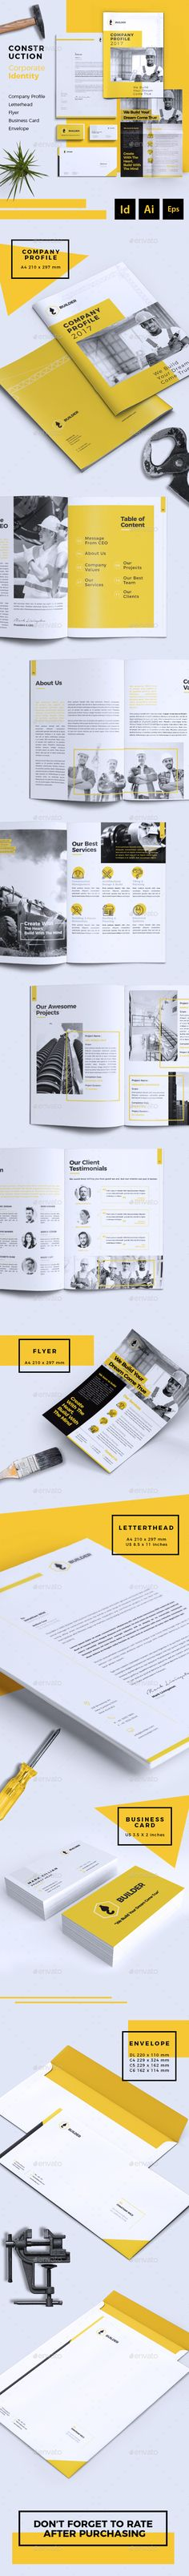 Builder   Construction Corporate Branding Identity Template InDesign INDD, AI Illustrator